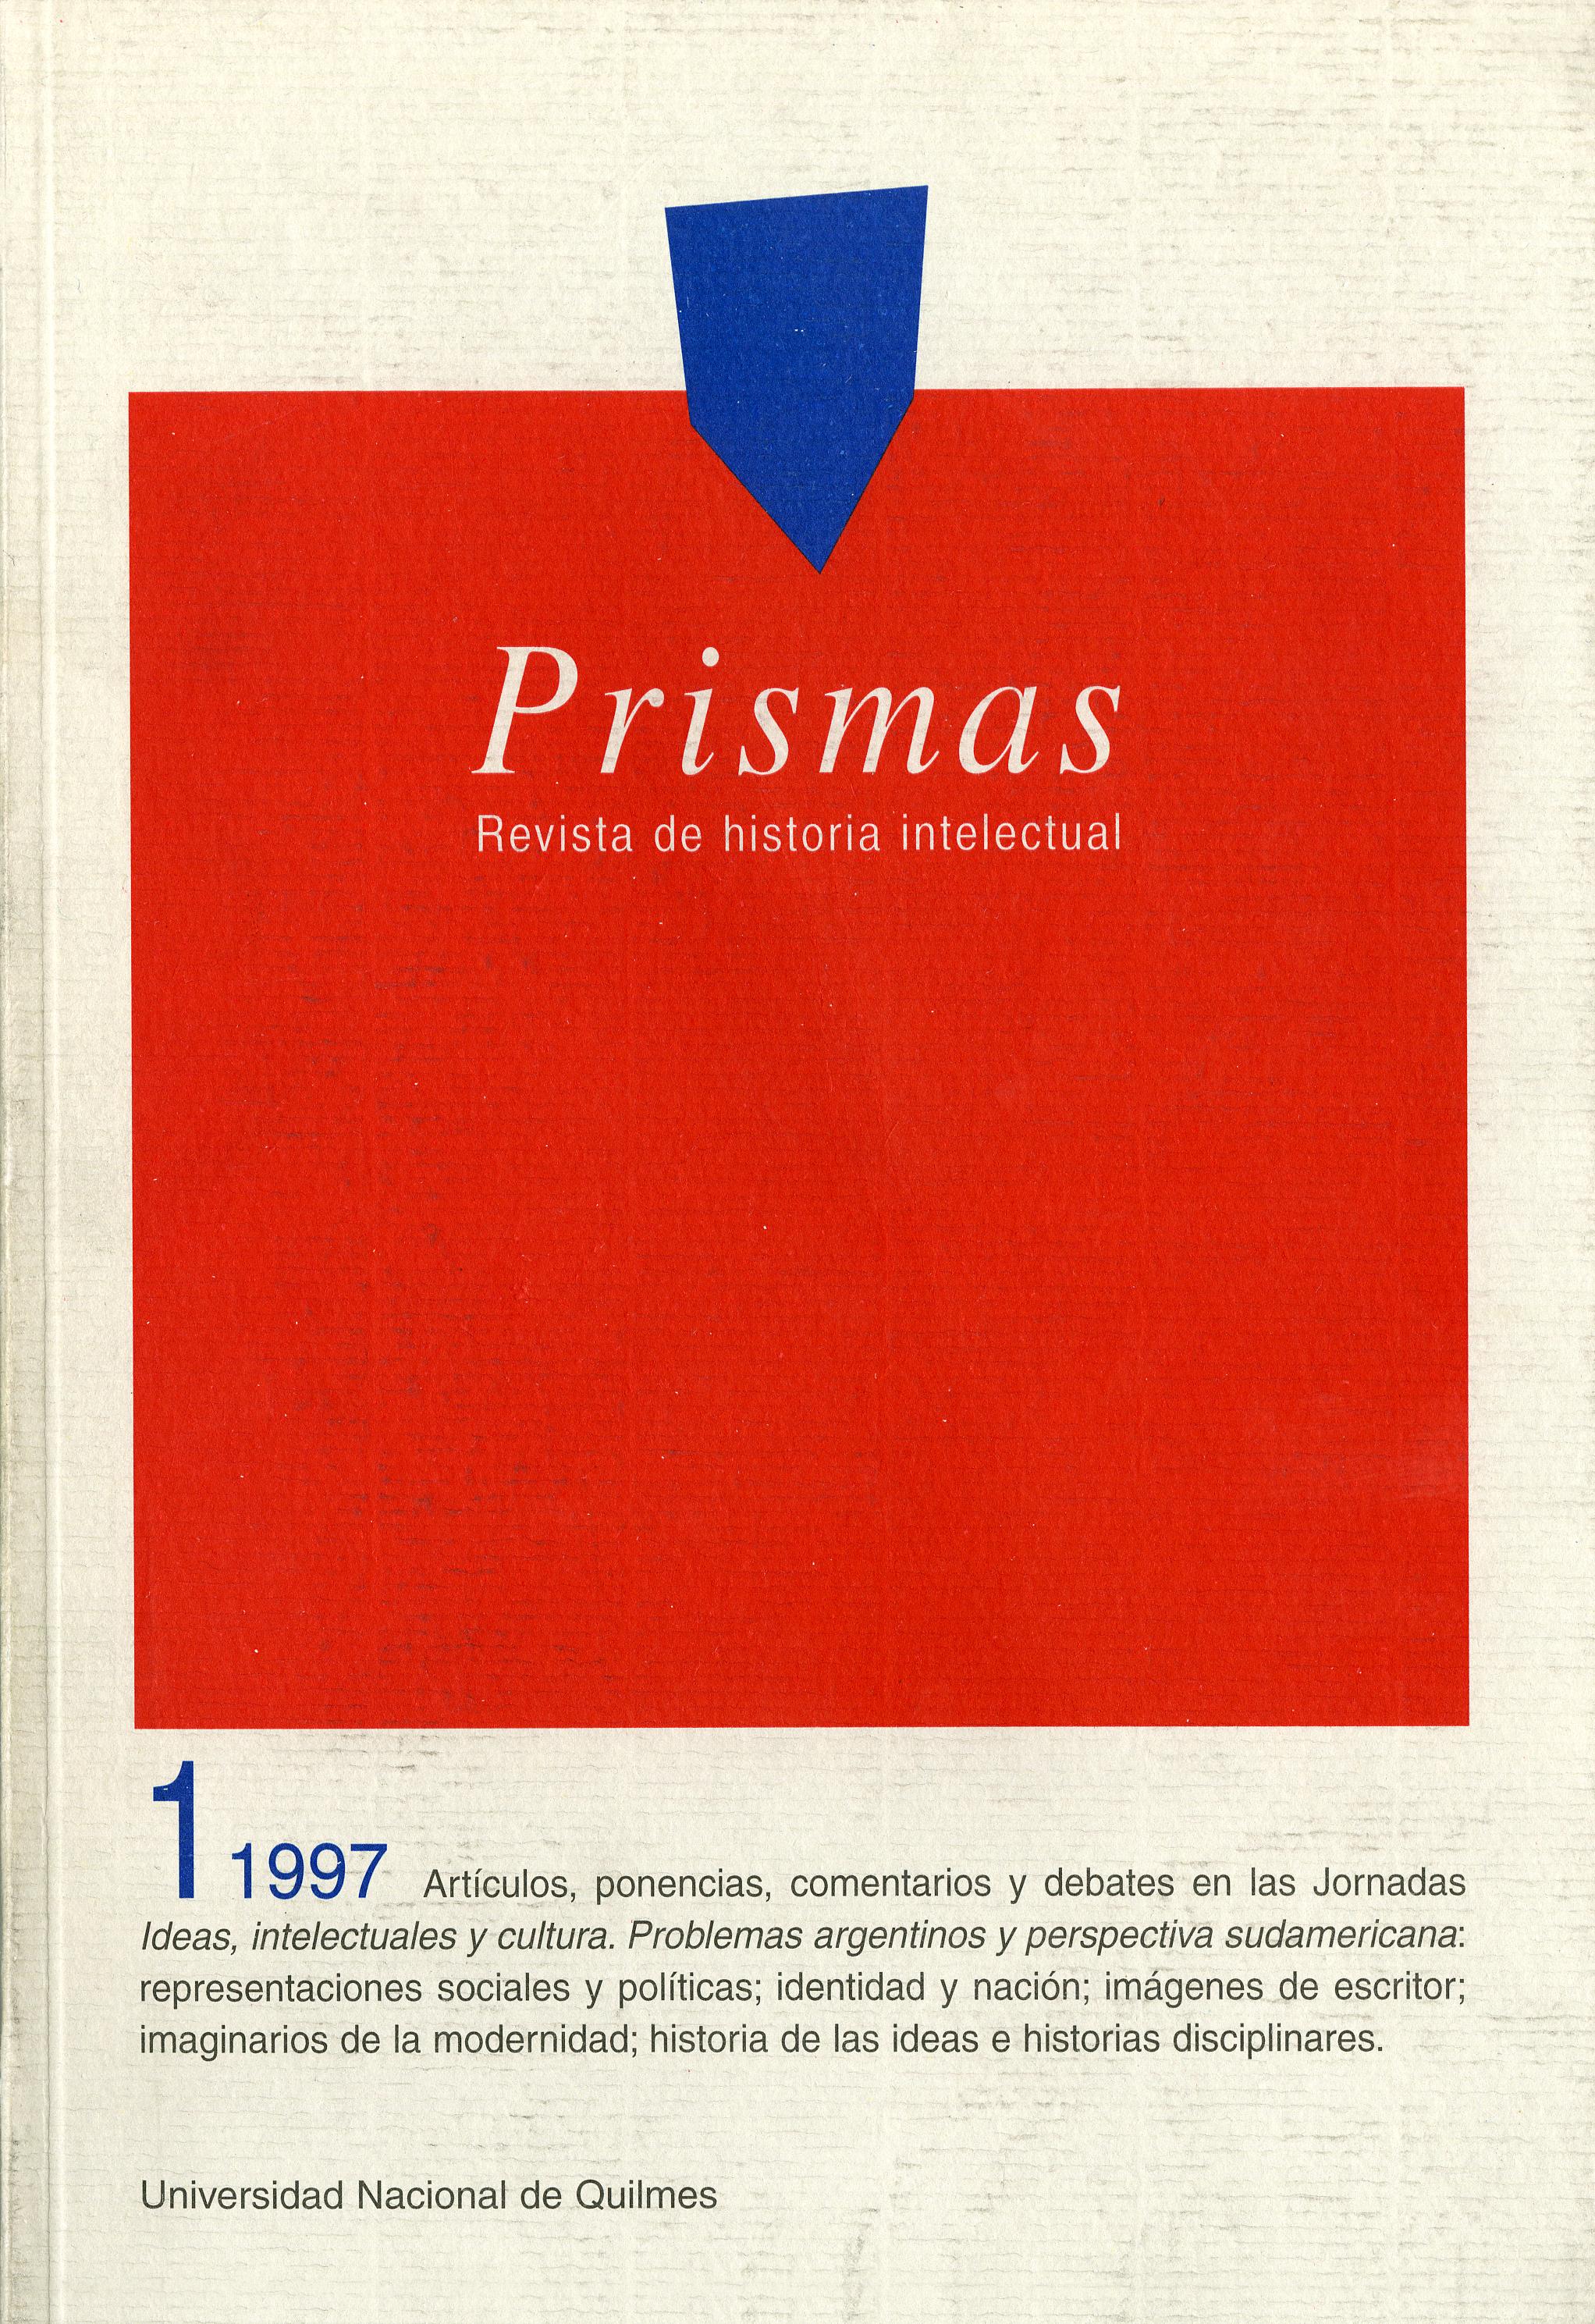 Prismas. Revista de Historia Intelectual